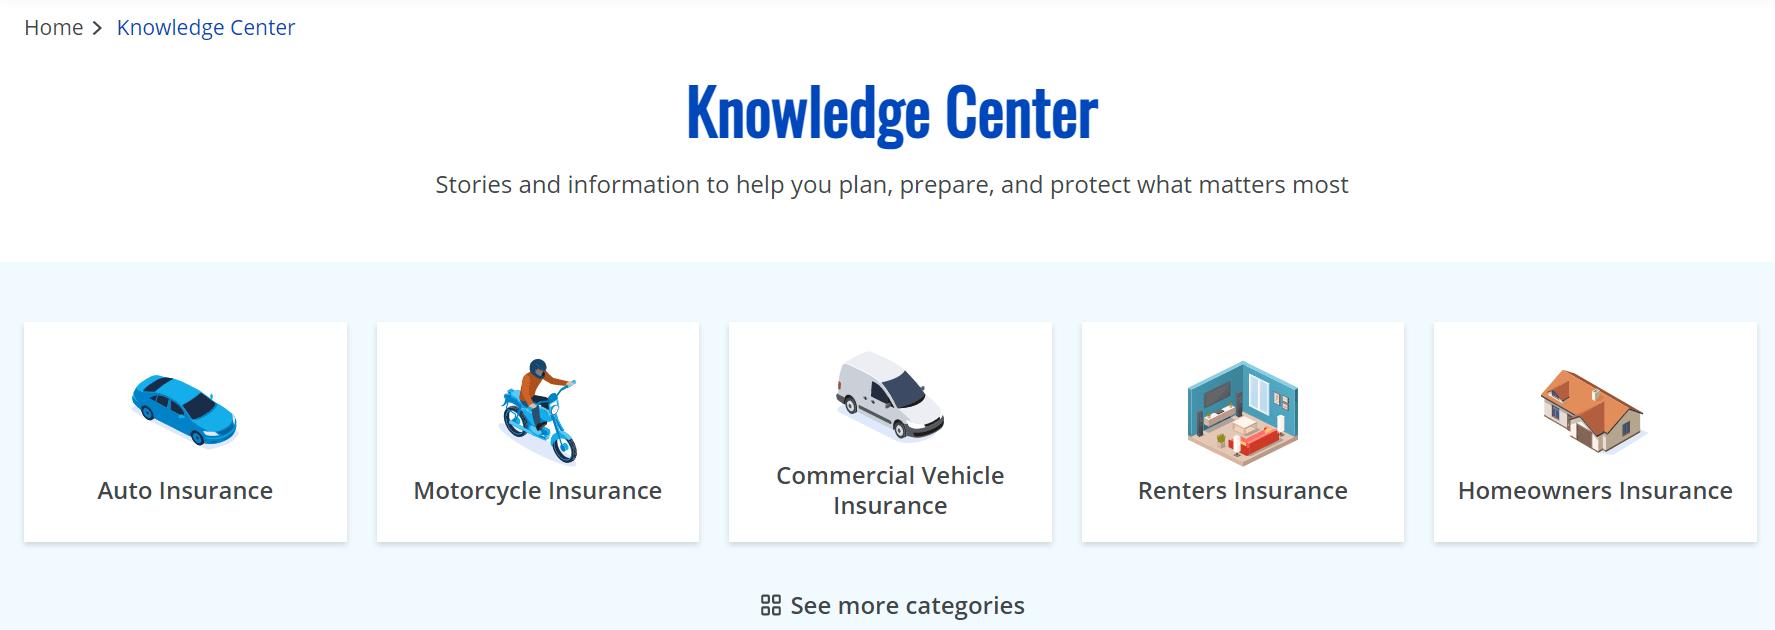 insurance-knowledge-center-seo